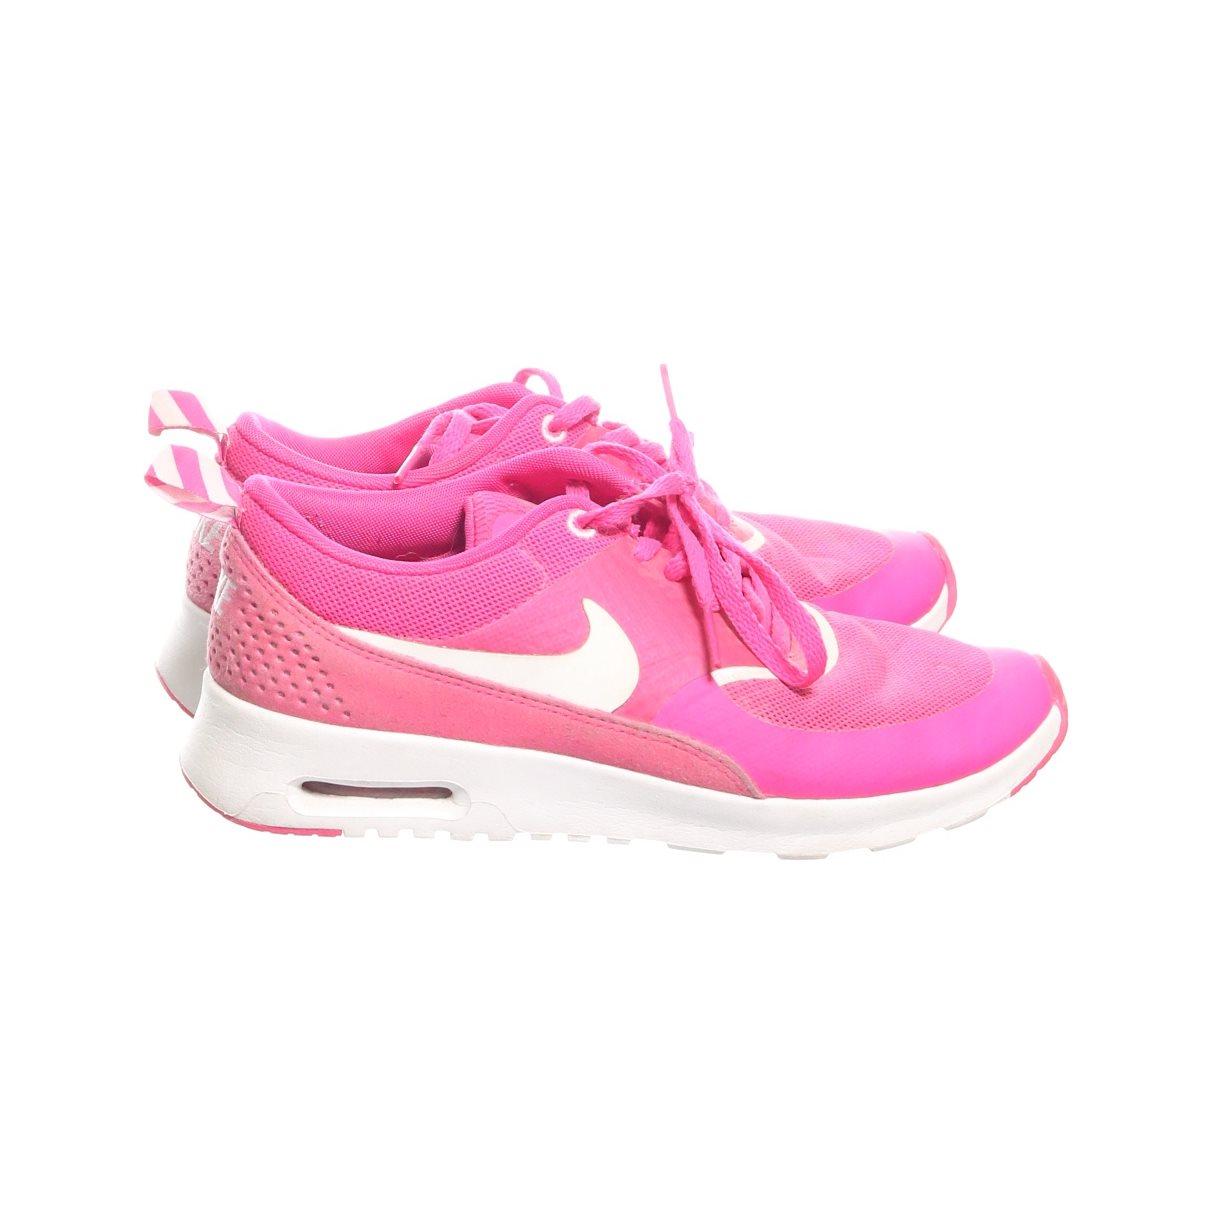 the best attitude 765d3 cce69 Nike, Träningsskor, Strl  38, AIR MAX THEA, Rosa Vit